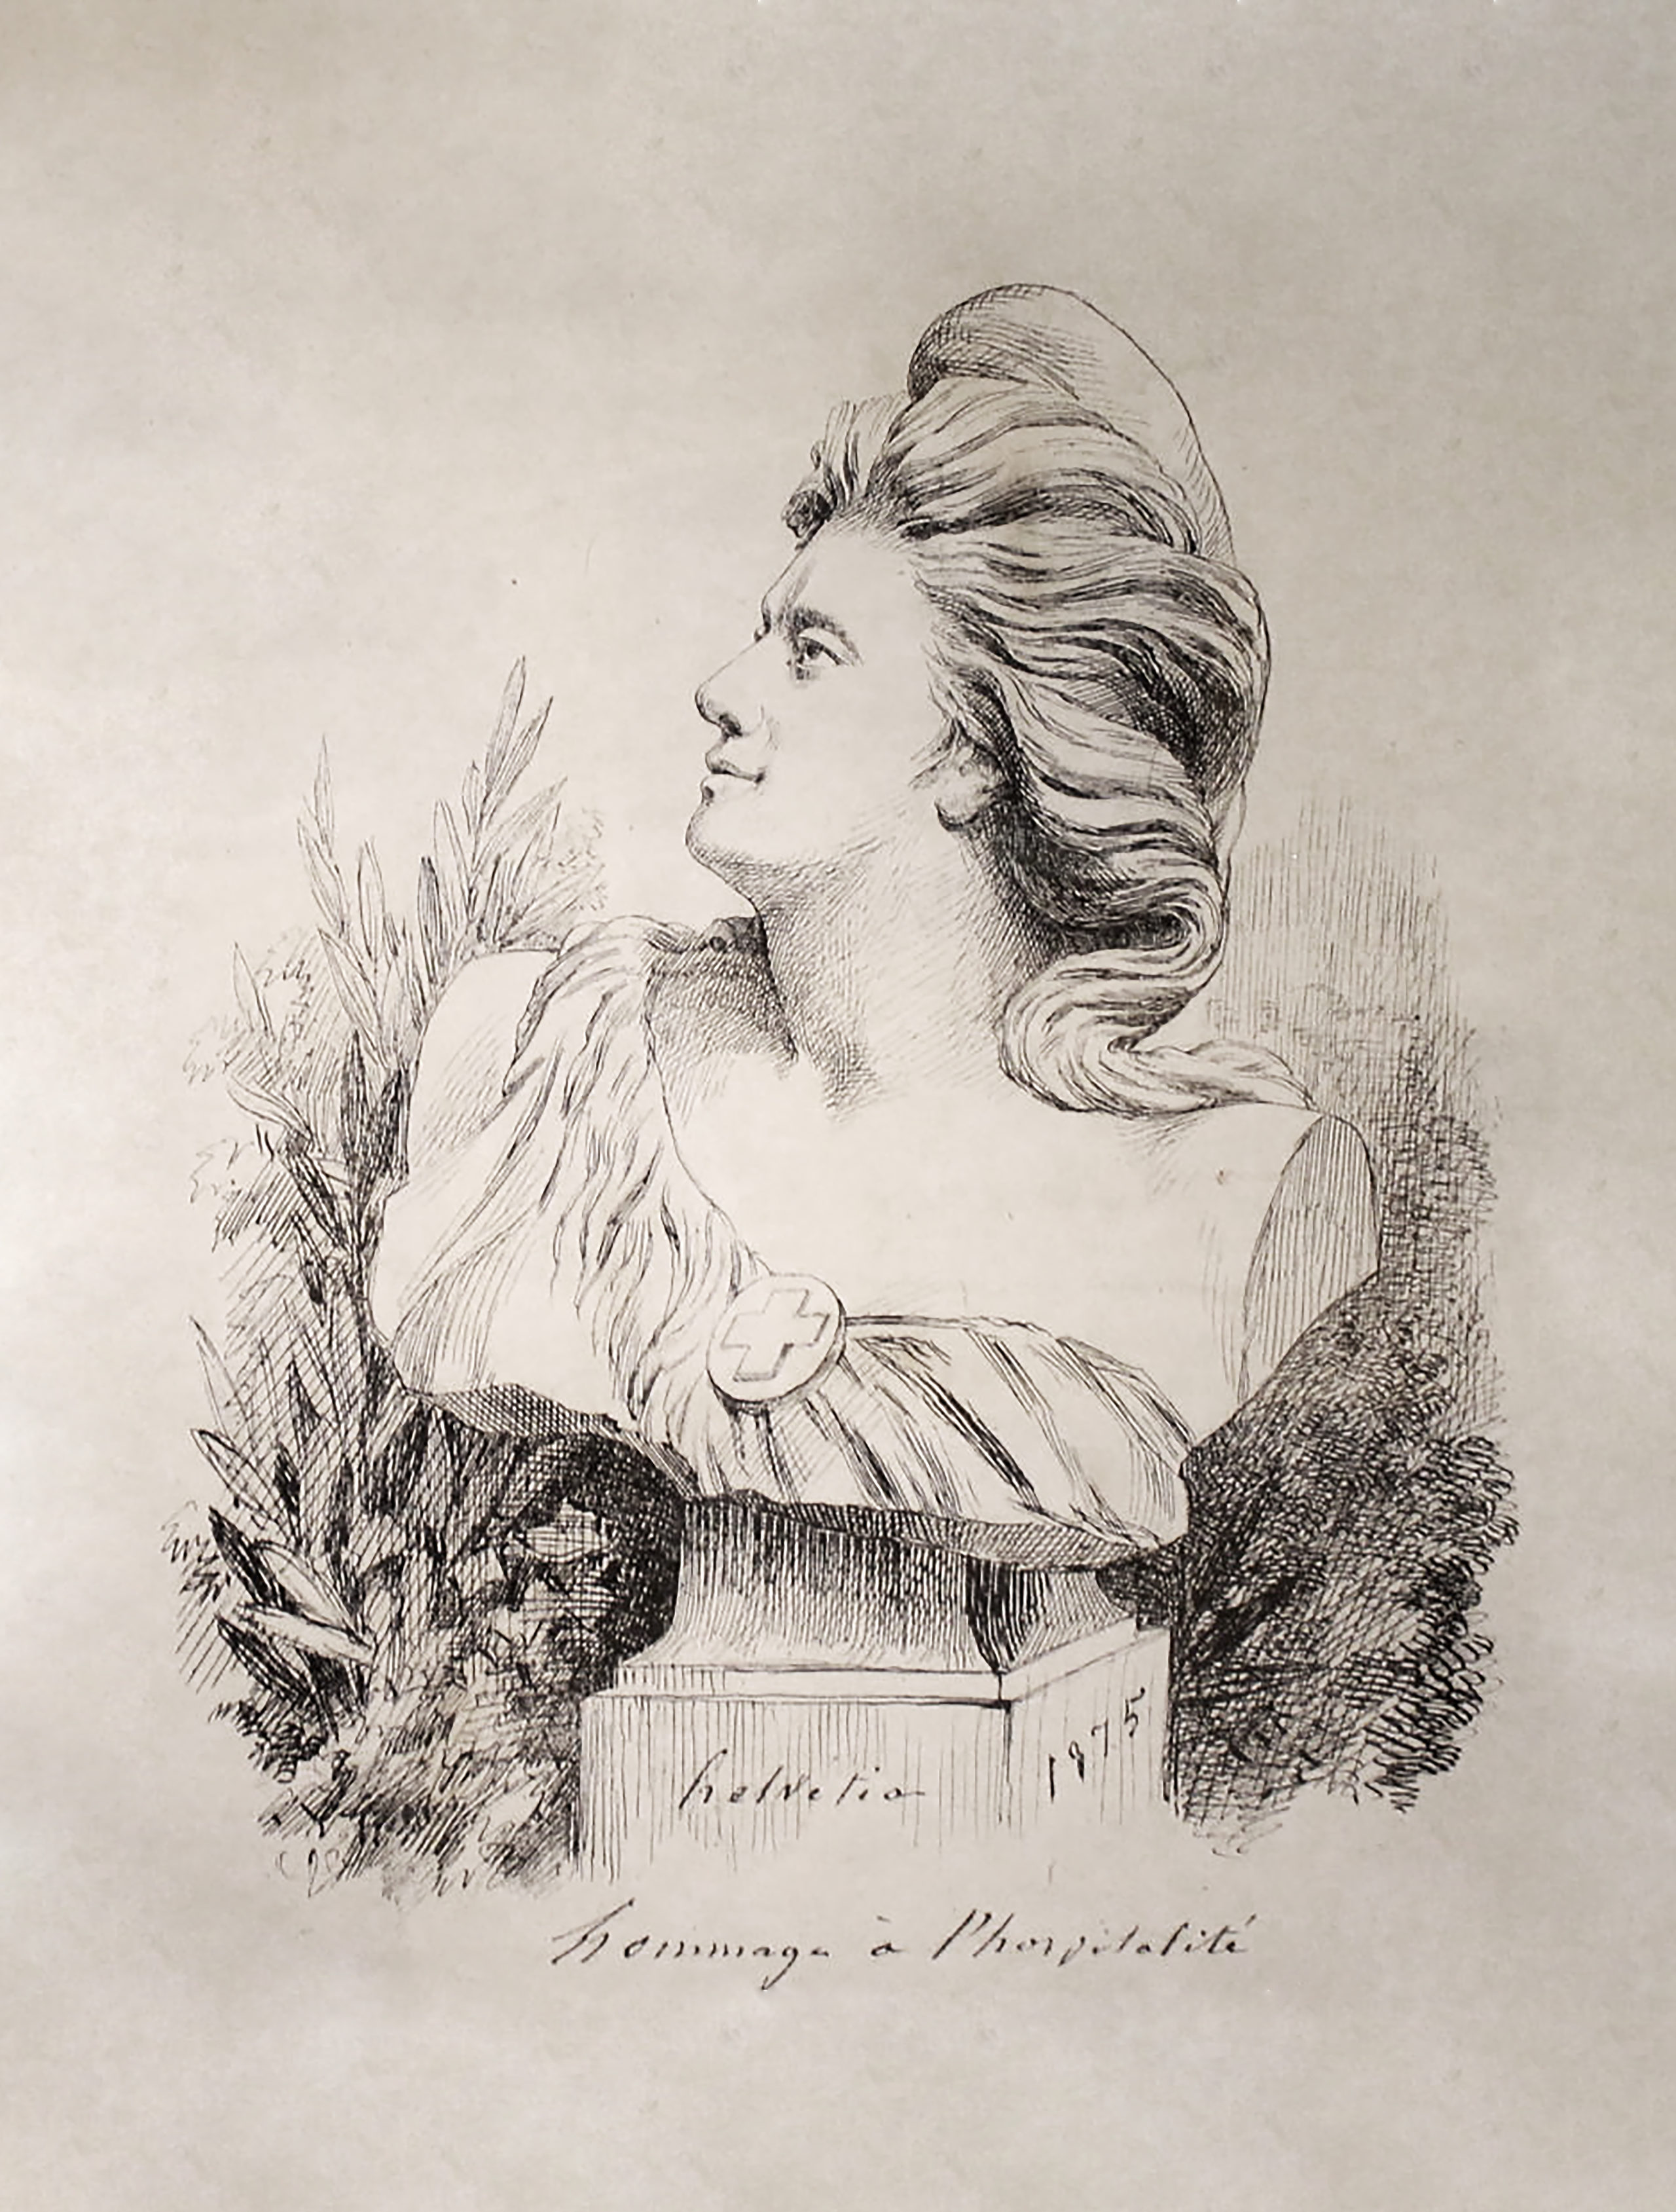 Helvétia, 1875, Lithographie auf Velin, Museum Jenisch, Vevey, Cabinet cantonal des estampes, Sammlung des Waadtlandes